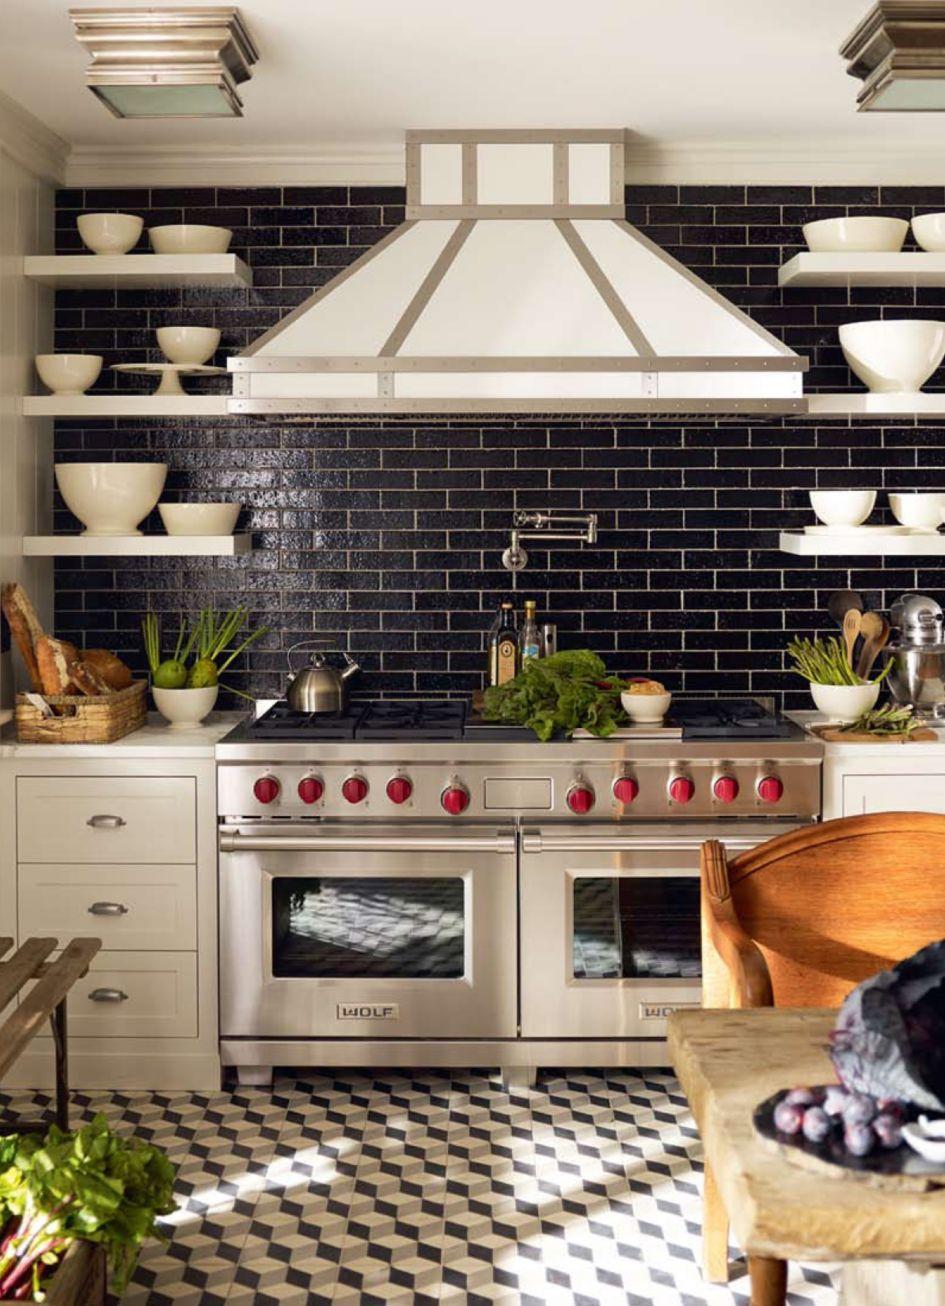 Black Brickworks Tile At Kitchen Wall With Waterworks Pot